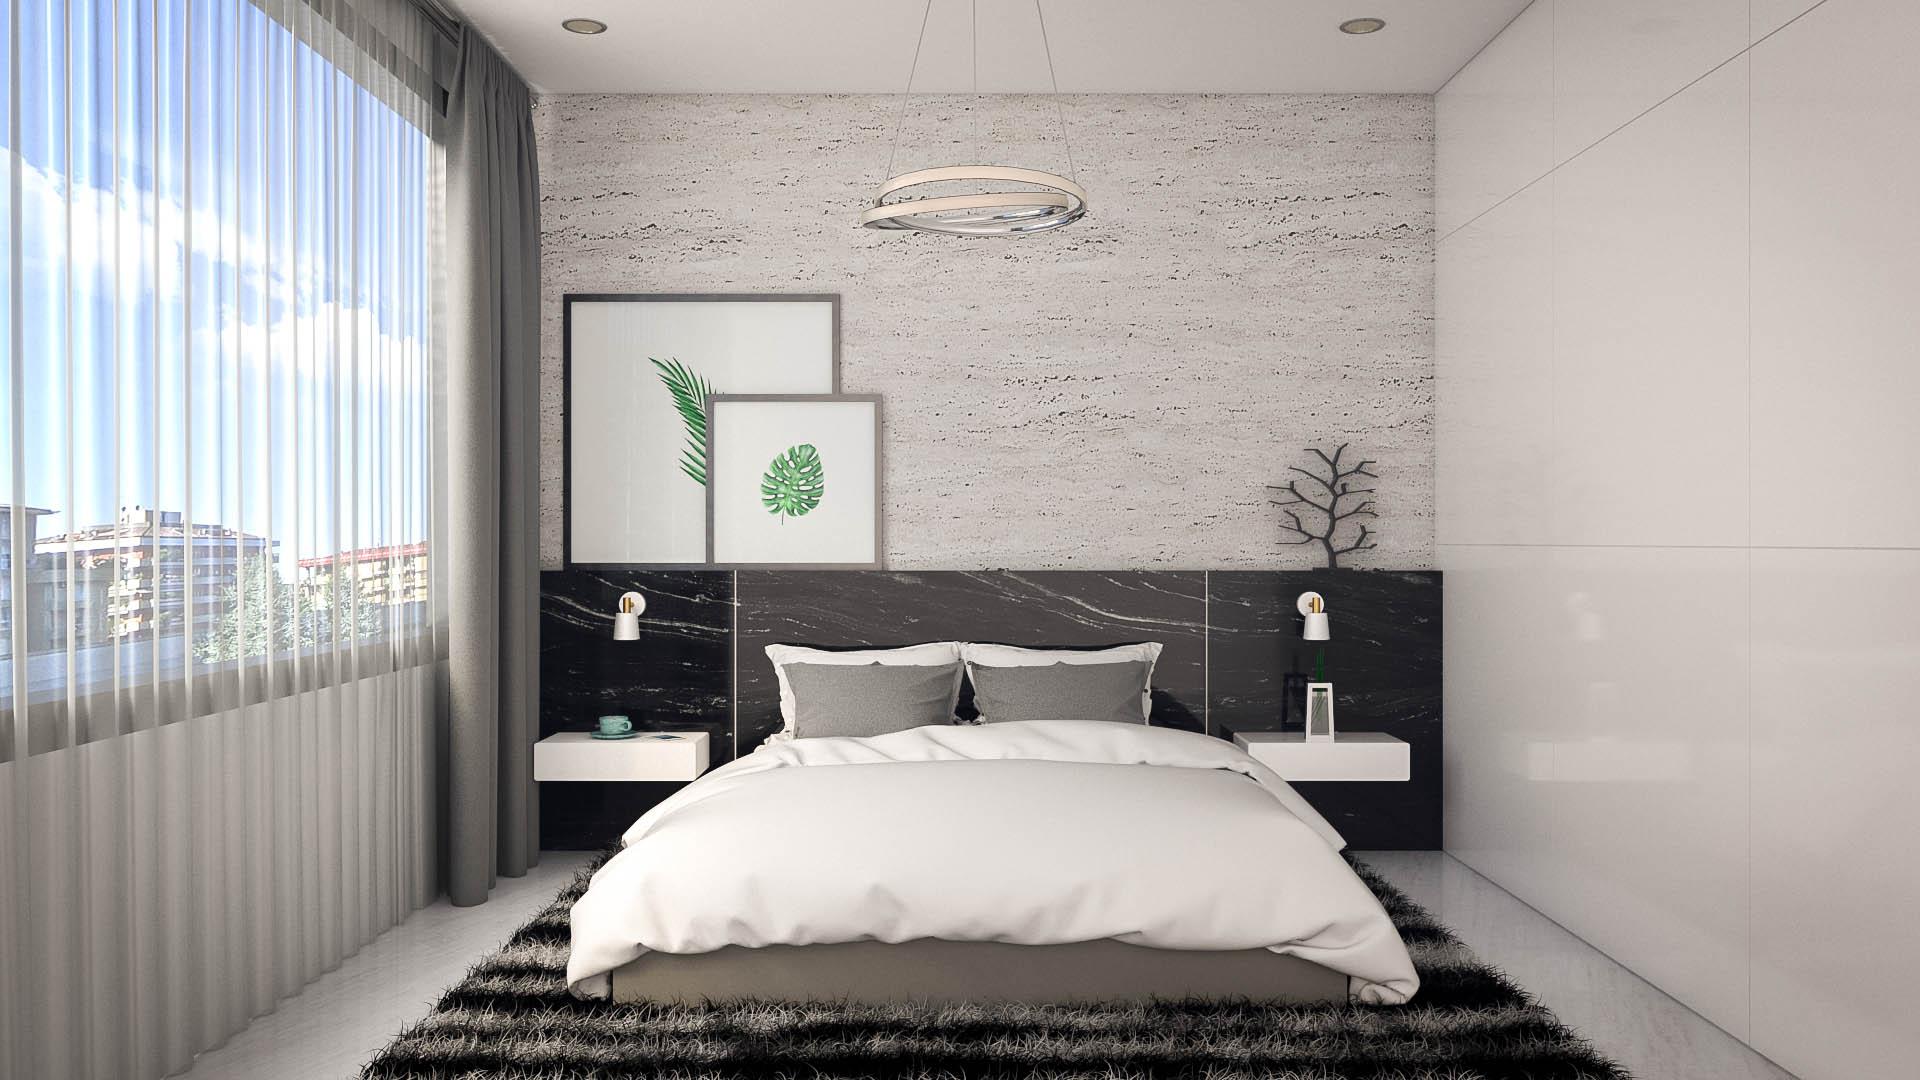 Small Modern Bedroom Design Ideas - roomdsign.com on Small Bedroom Ideas  id=27757